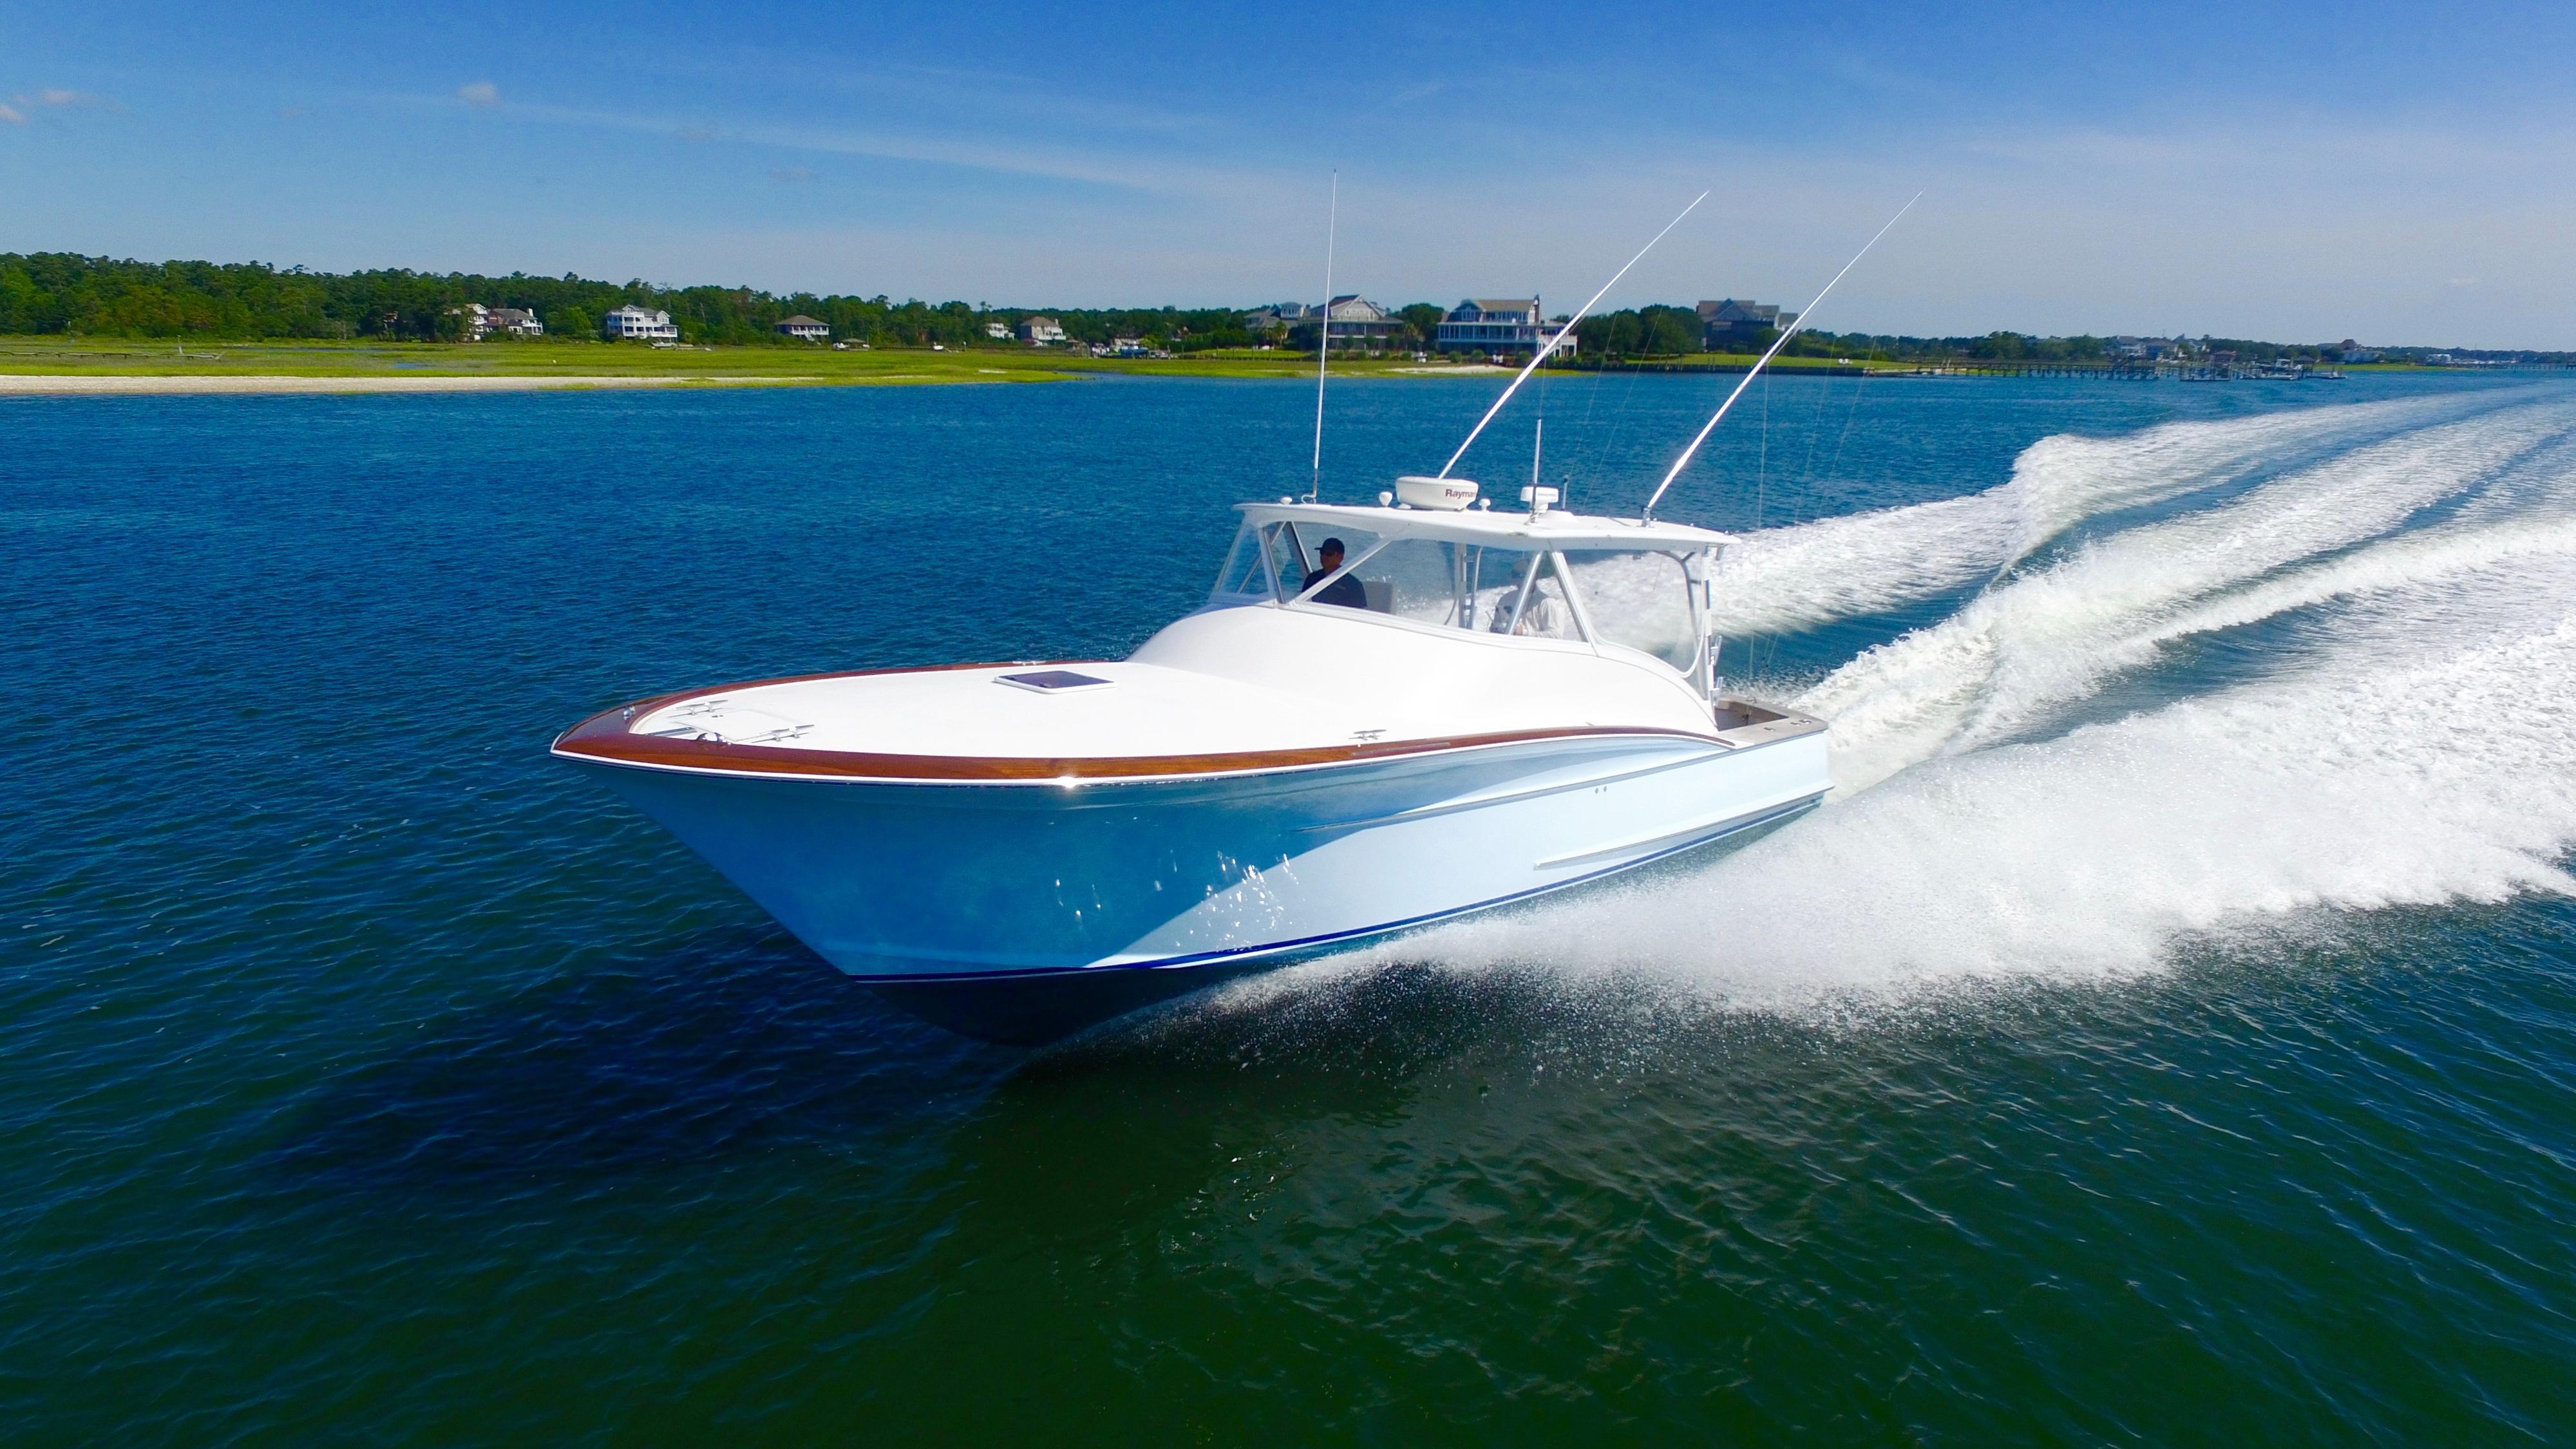 2012 Winter Custom Carolina 38 Express Power Boat For Sale